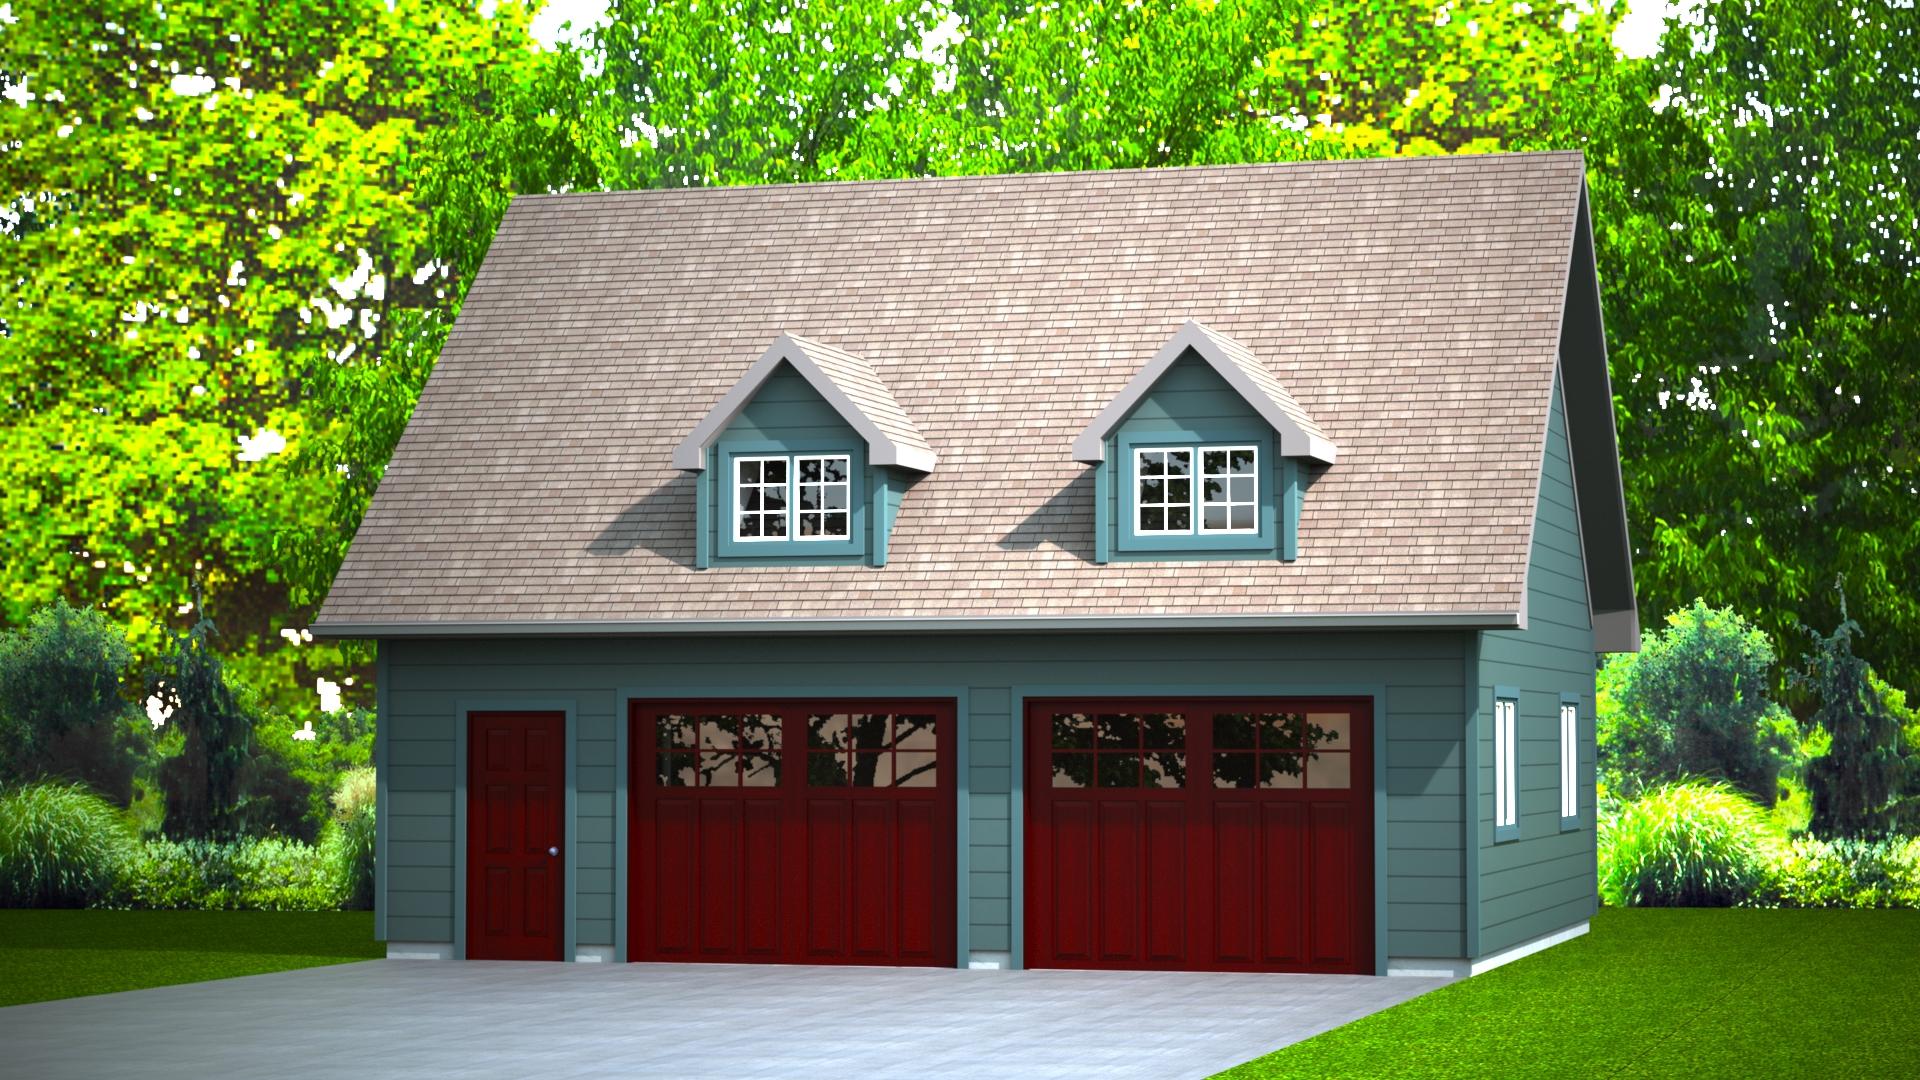 768 sq.ft. timber mart 2 car garage exterior render